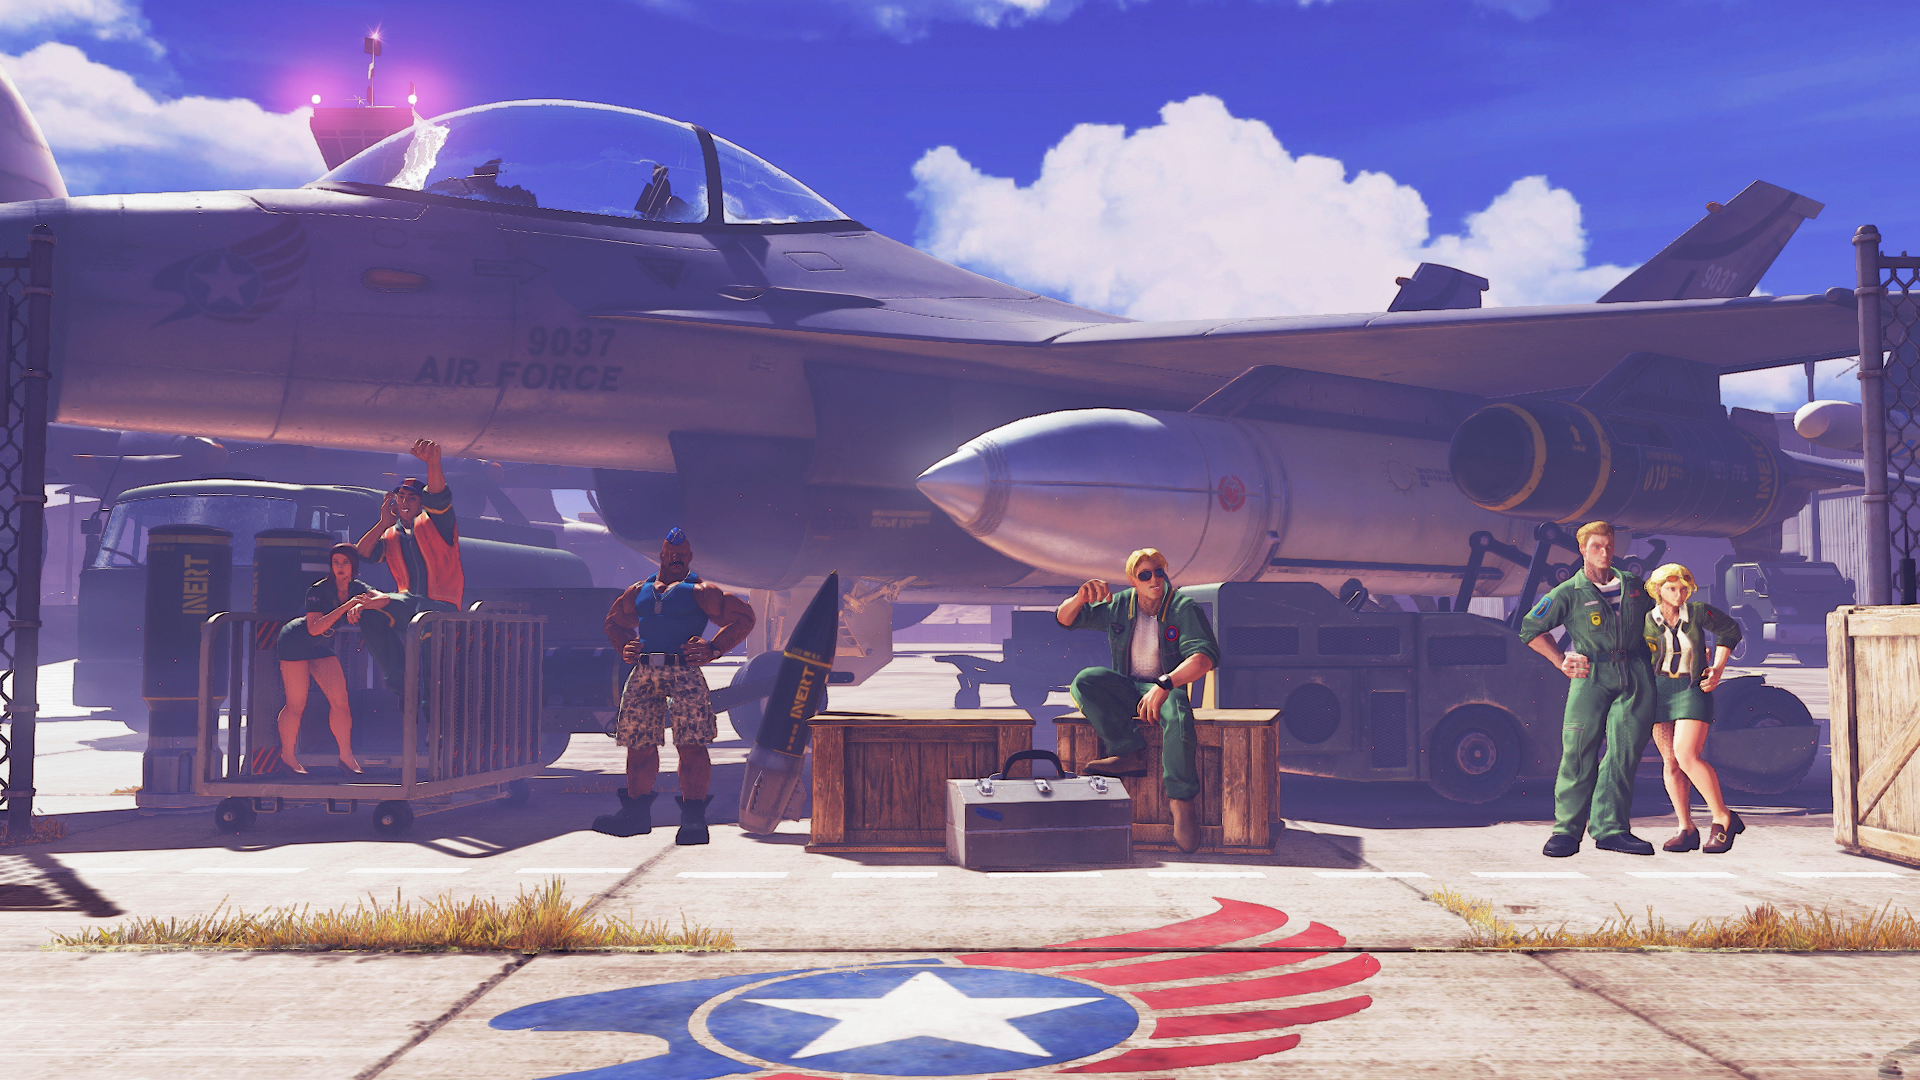 Street Fighter V Air Force Base